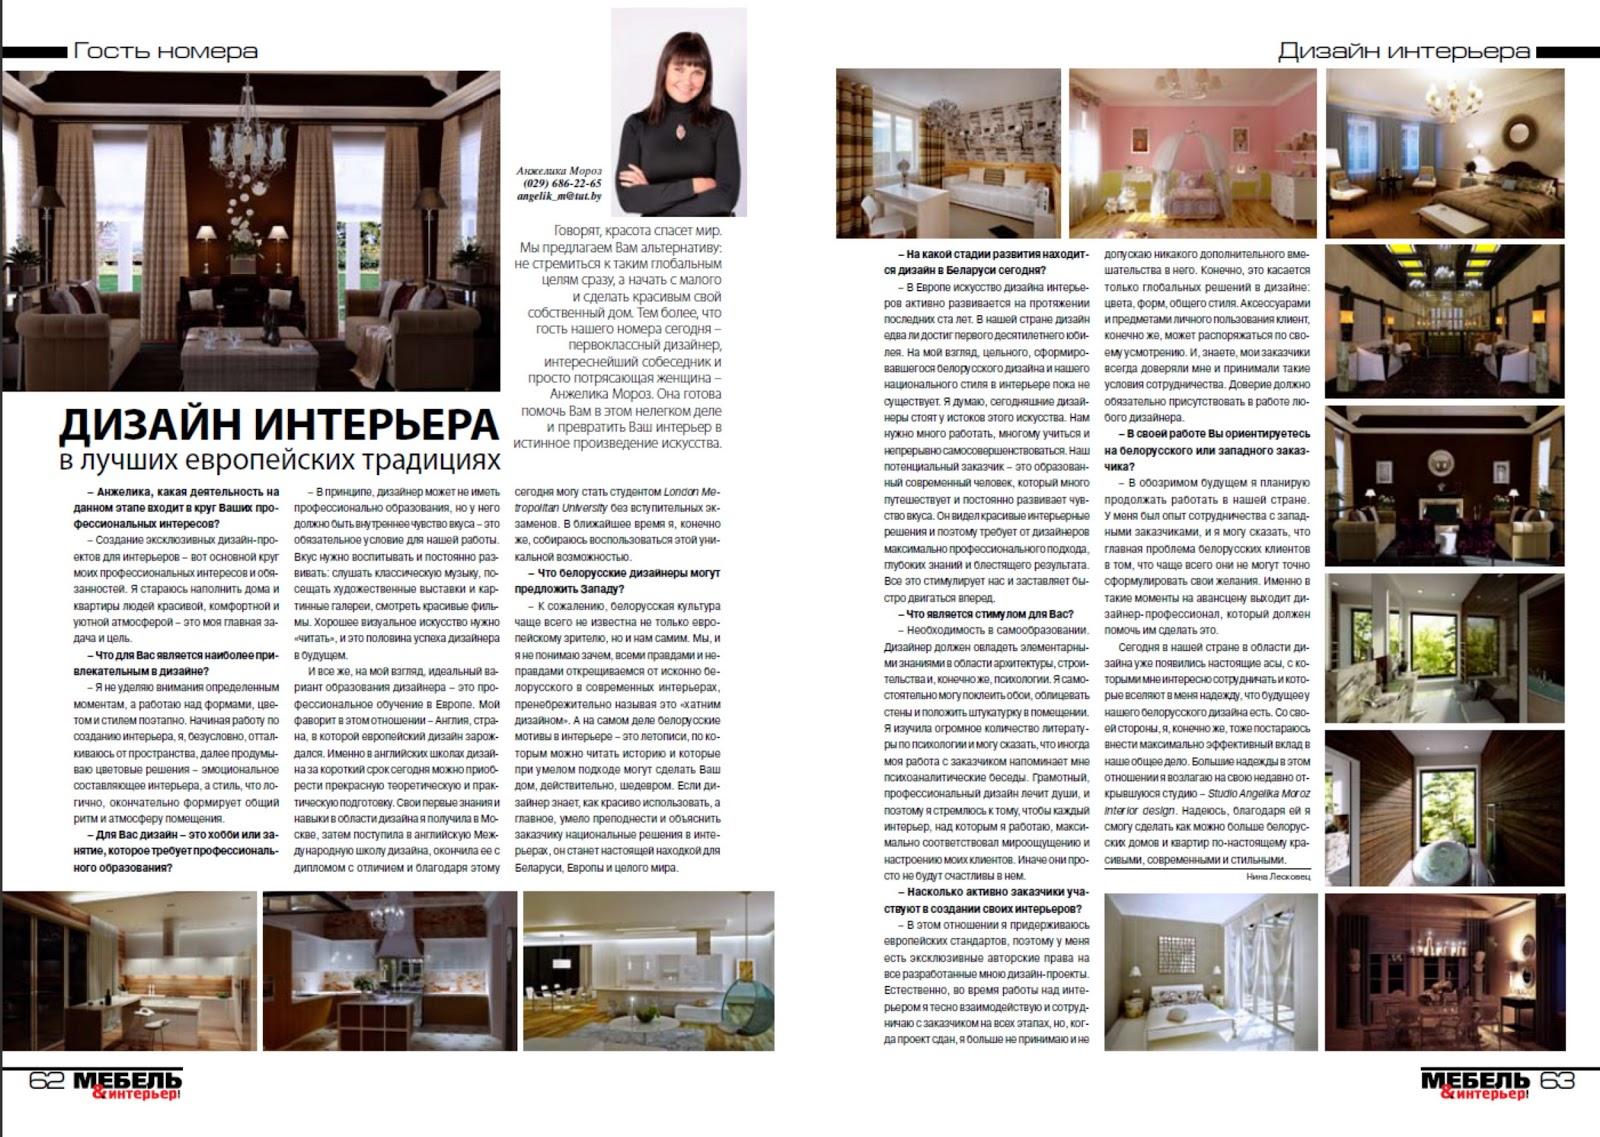 Журналы про дизайн и интерьер фото 2